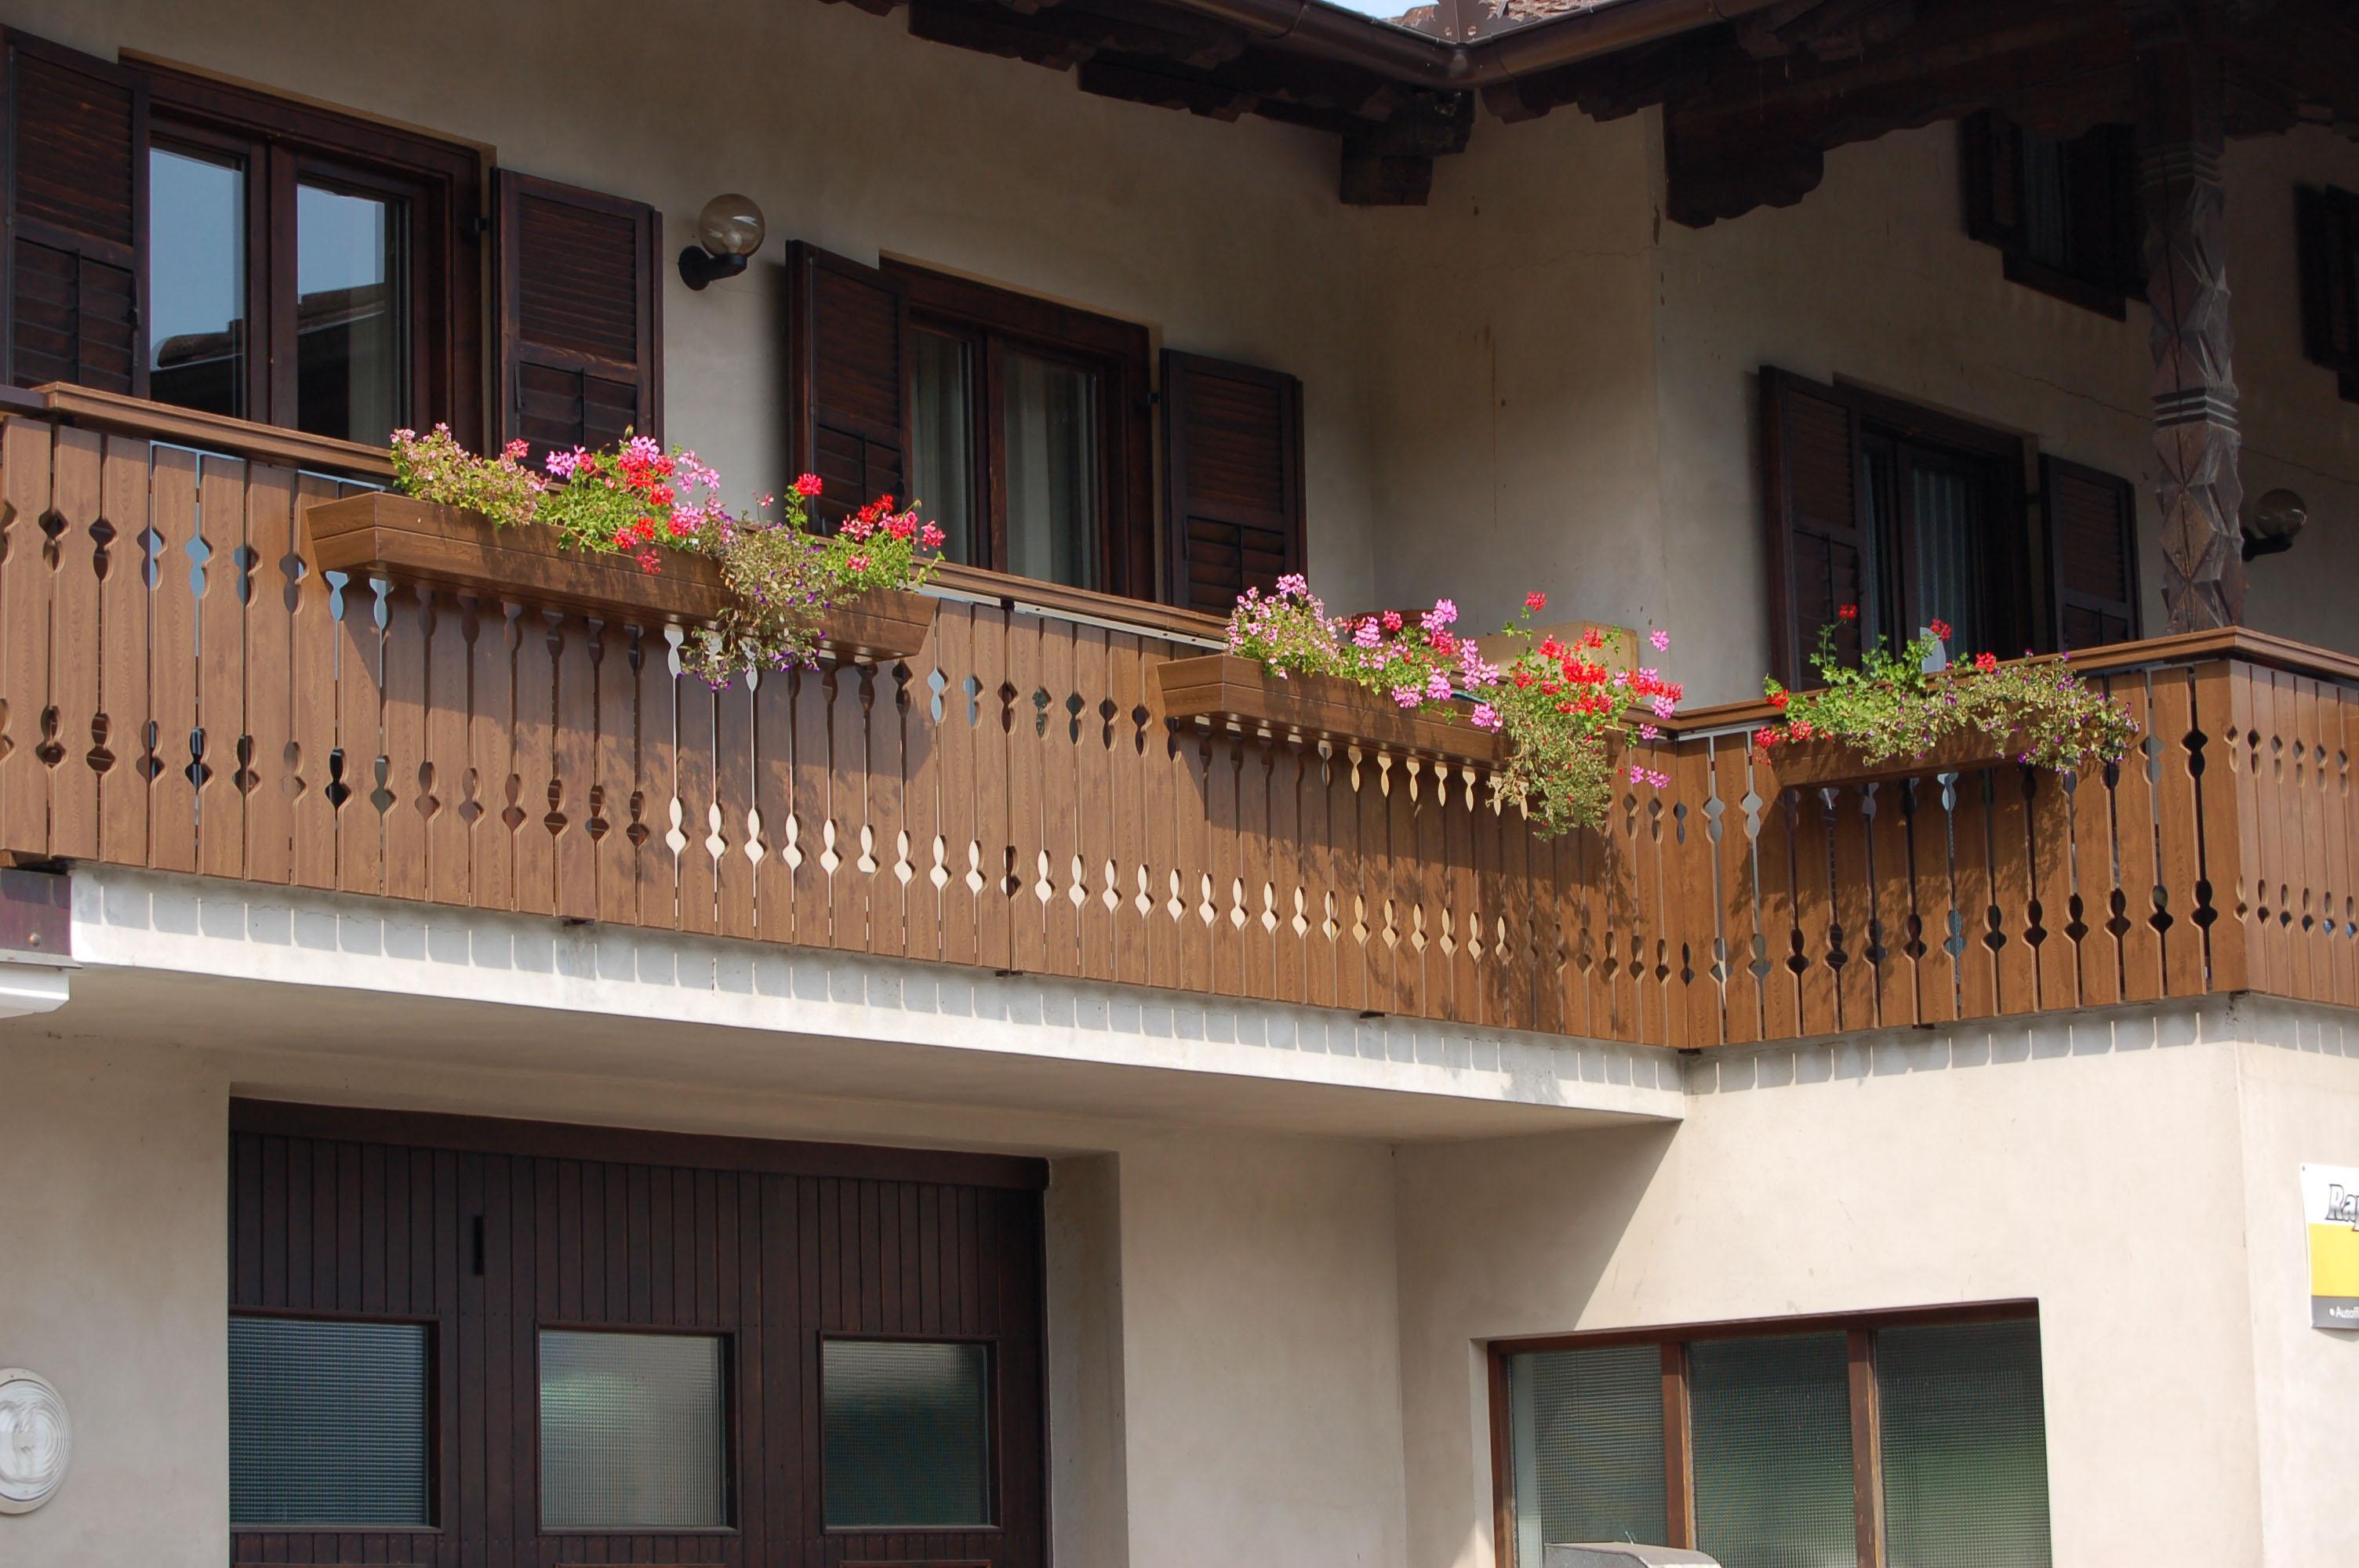 Recinzioni in pvc eurofinestre infissi in pvc in classe a - Porta balcone pvc prezzi ...